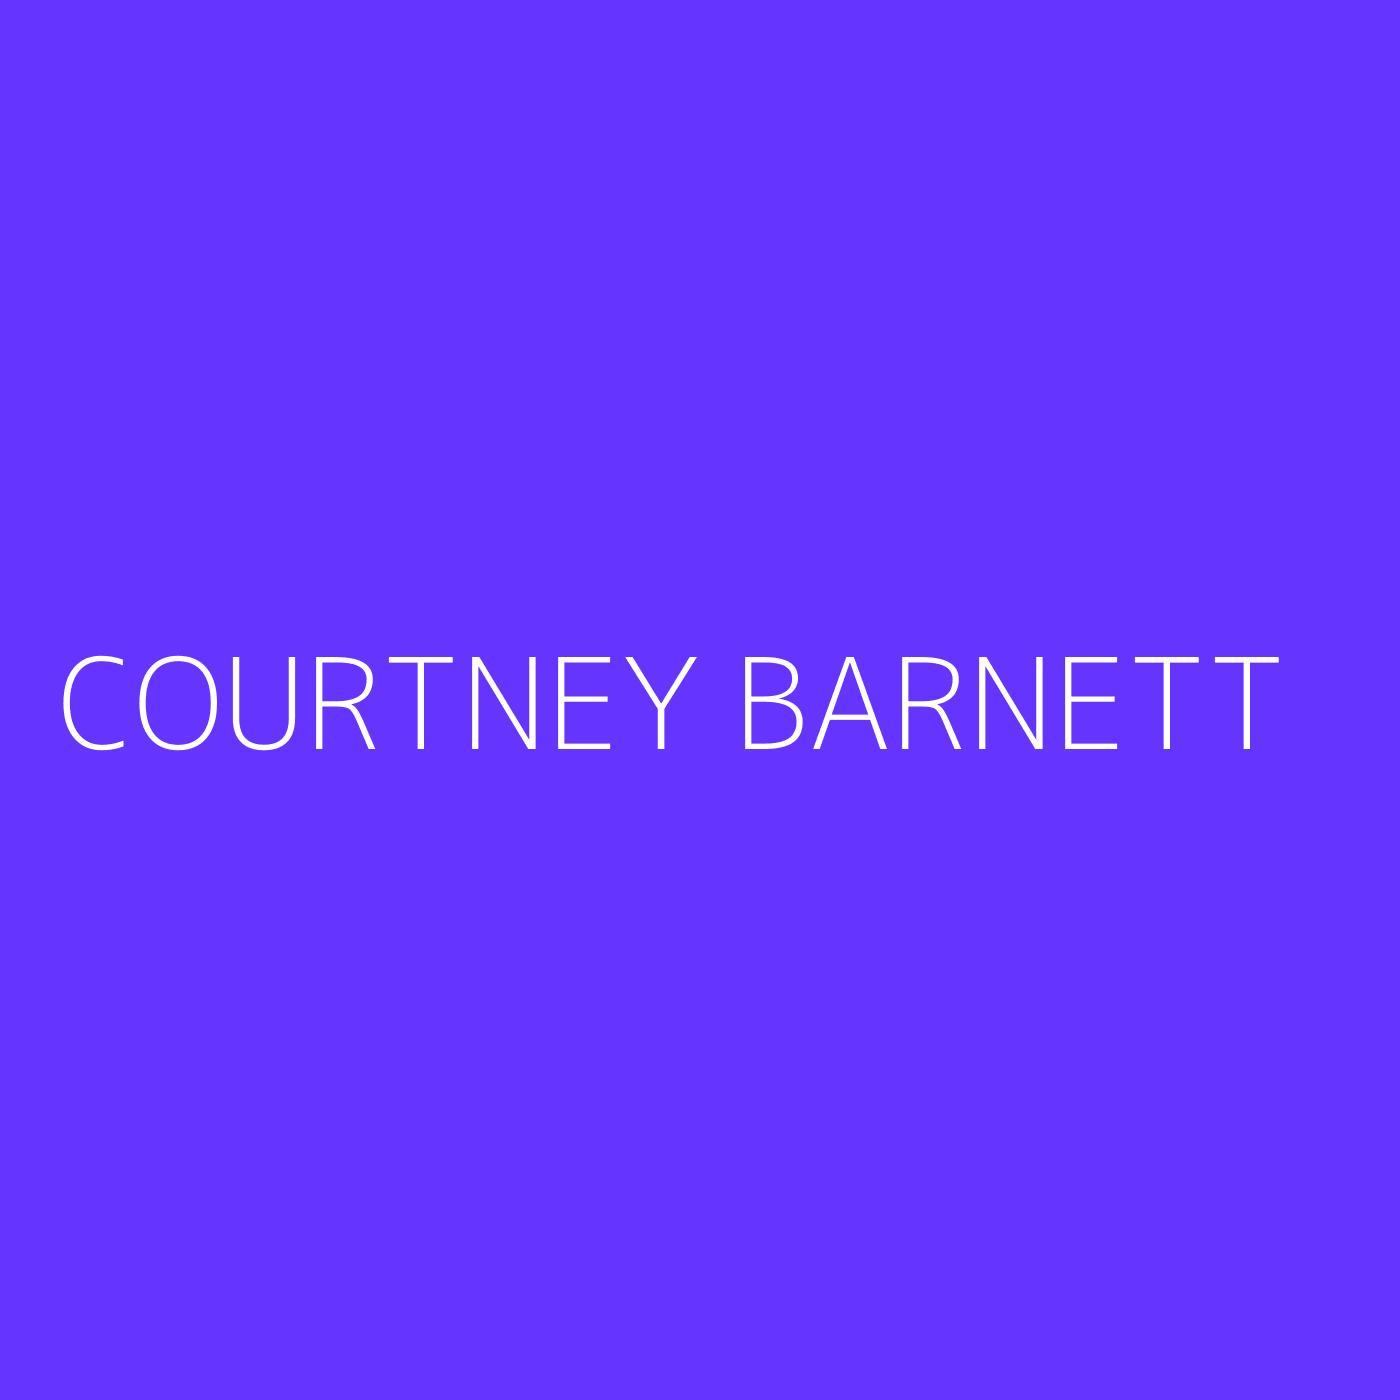 Courtney Barnett Playlist Artwork